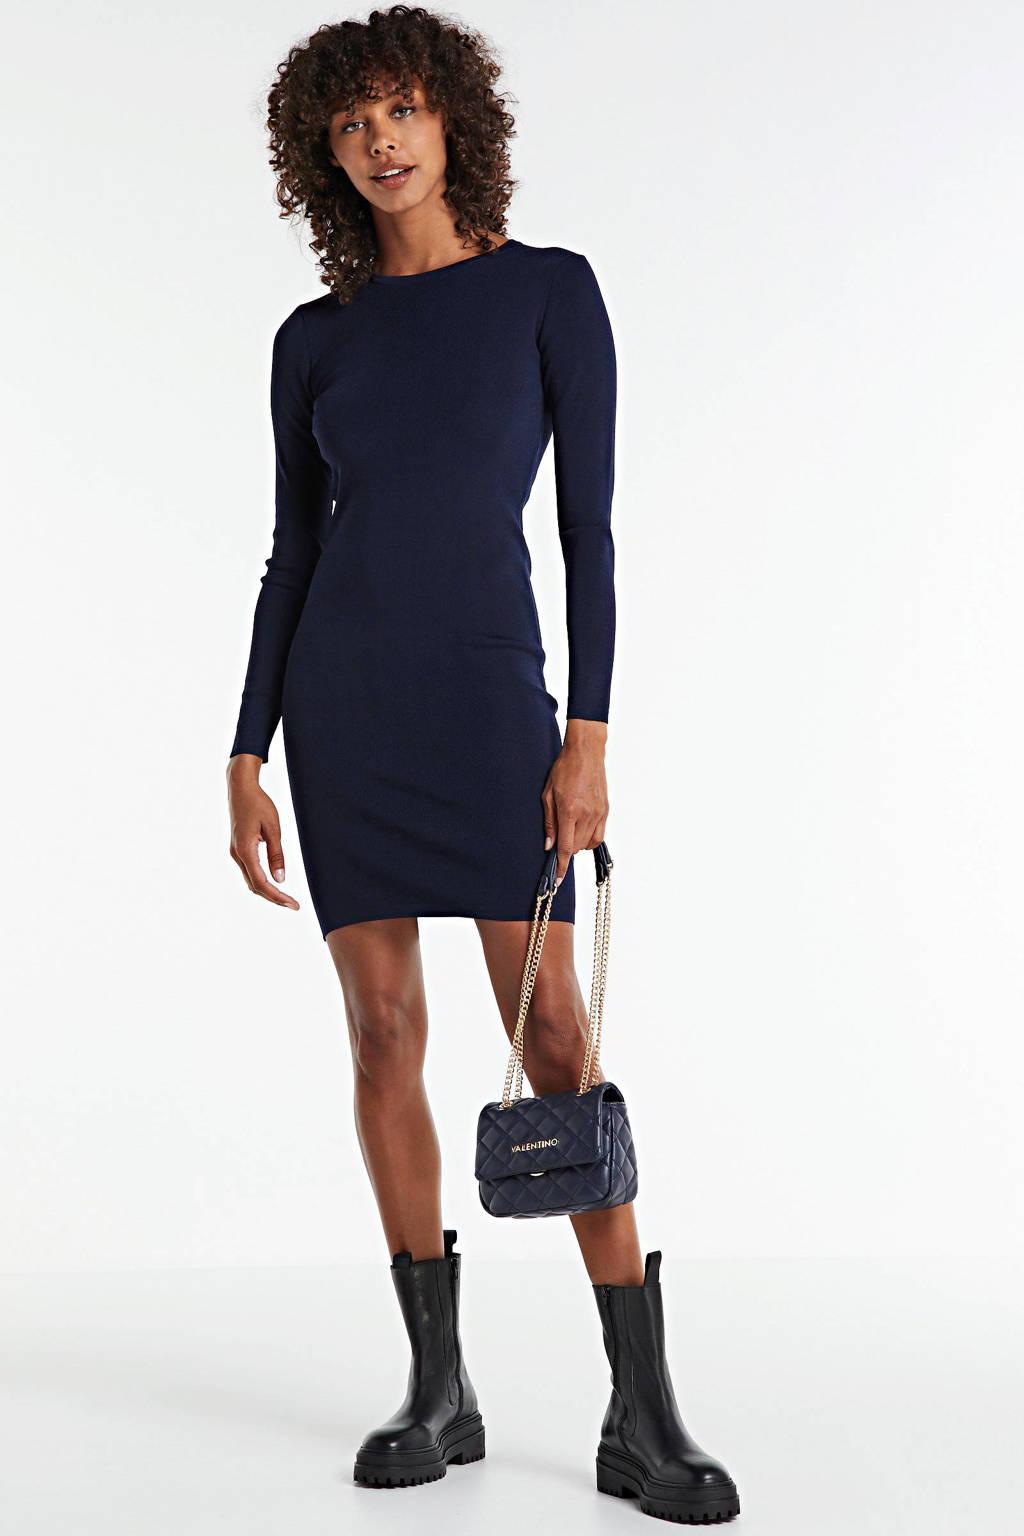 NIKKIE jurk Jolie donkerblauw, Donkerblauw